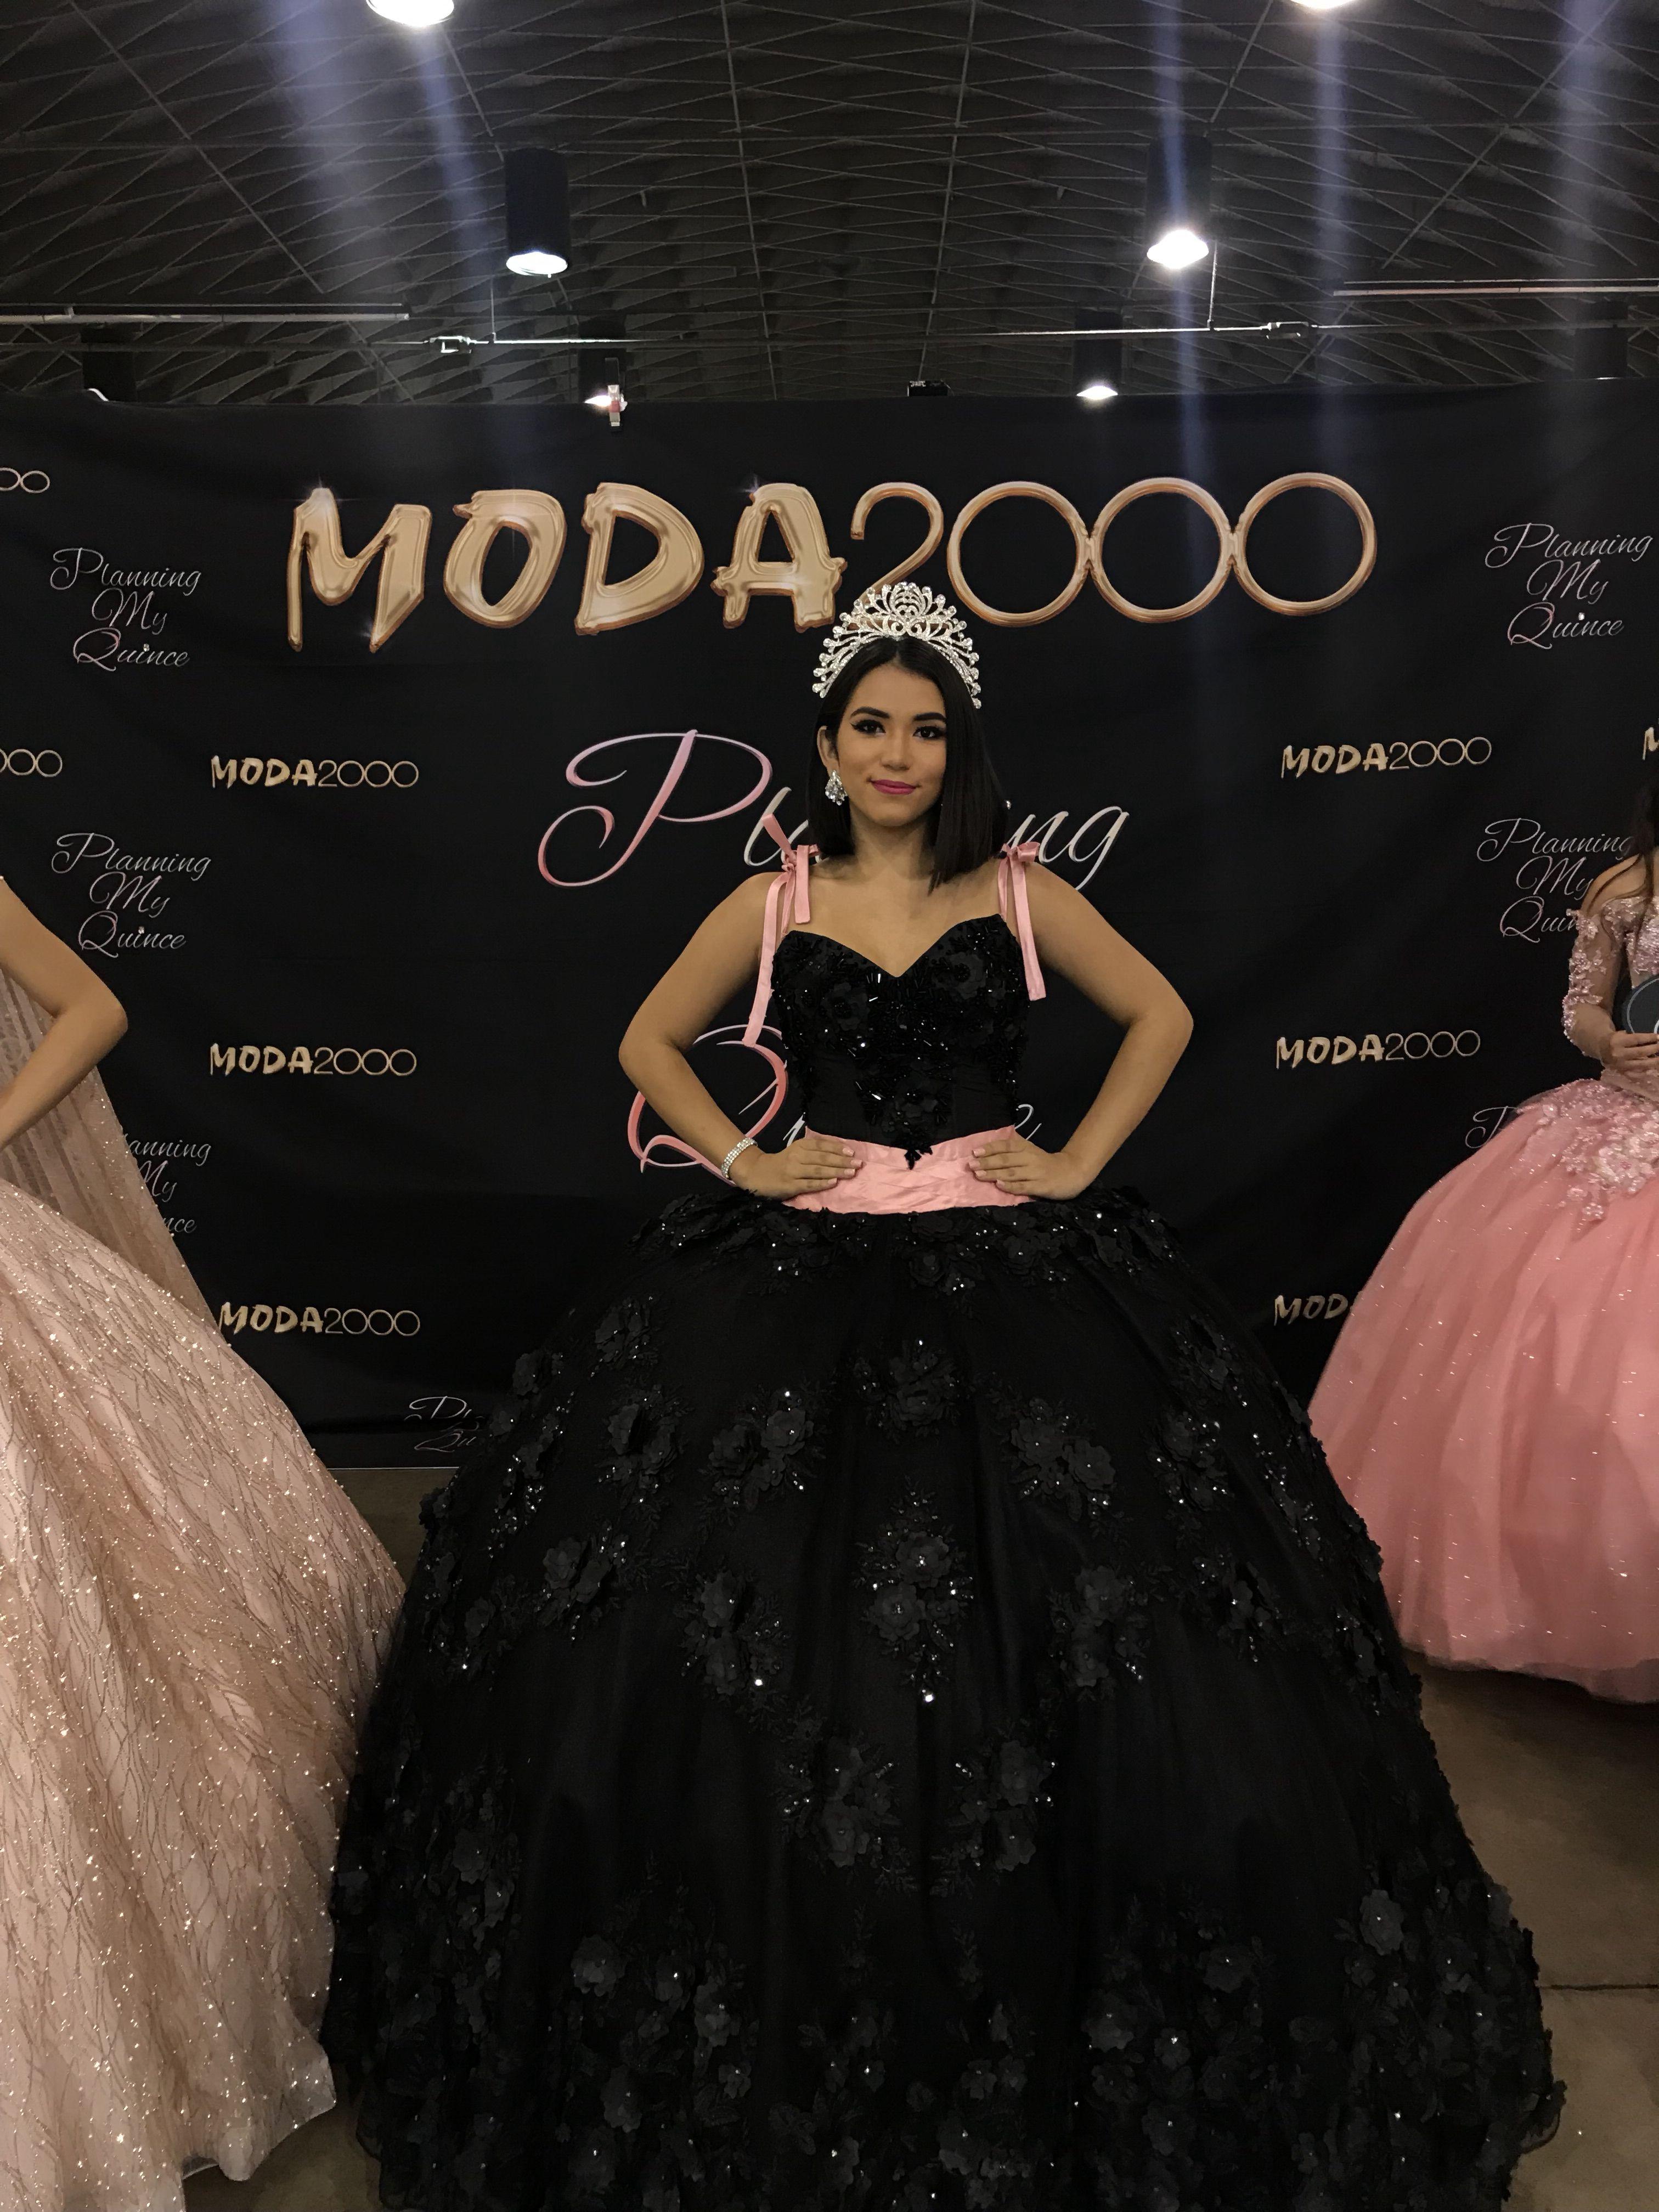 Stunning Black And Pink Off The Shoulder Quinceanera Sweet 16 Dress Sweet 16 Dresses Quinceanera Dresses Disney Princess Dresses [ 4032 x 3024 Pixel ]